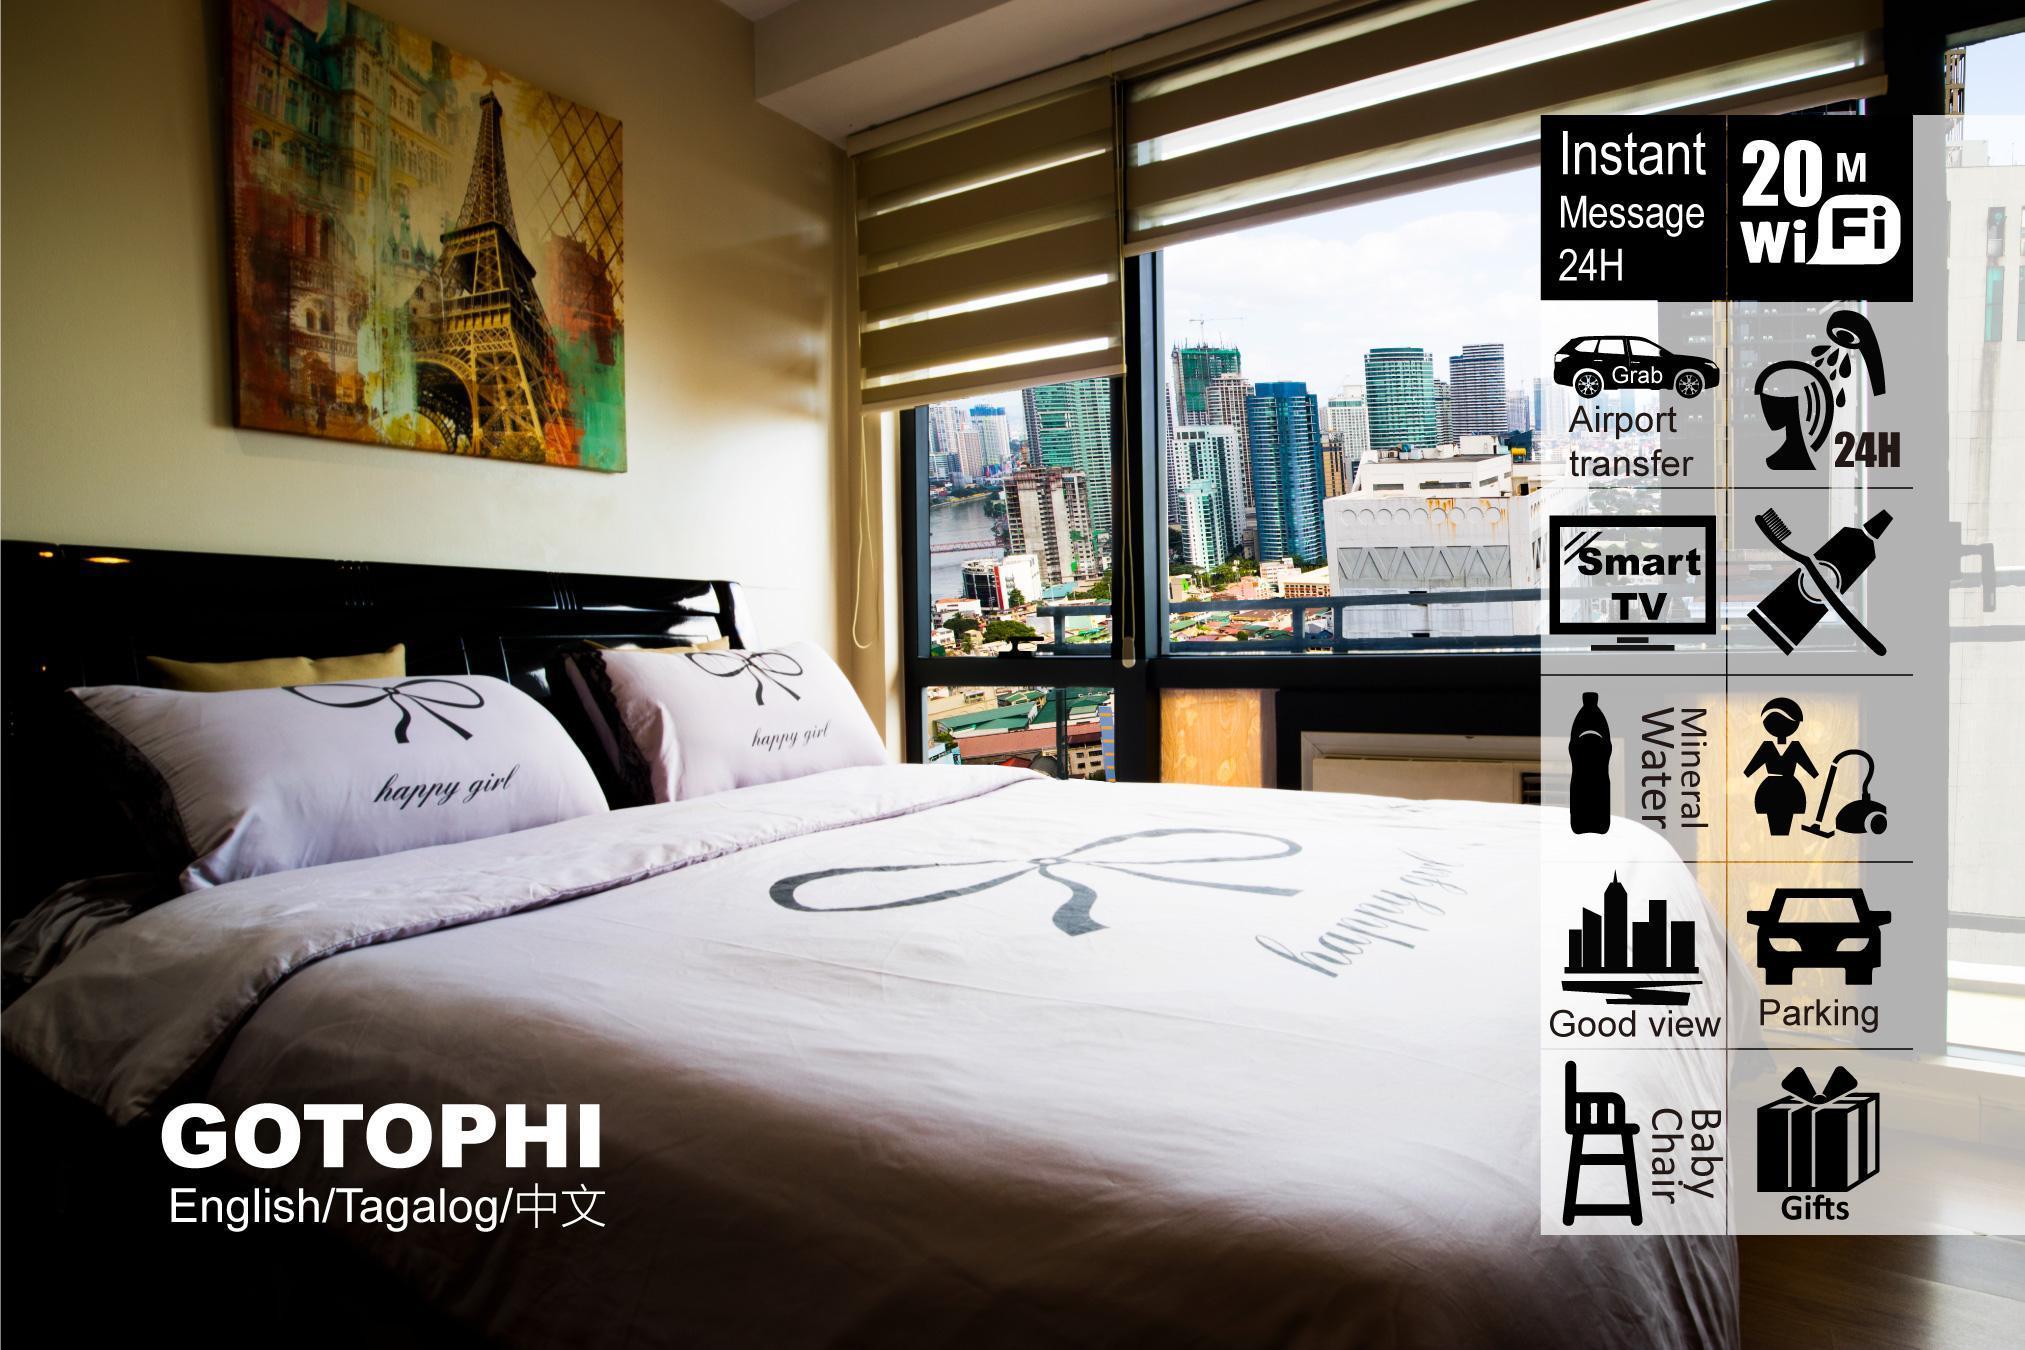 Gotophi Luxurious 5Star hotel Gramercy Makati 3311